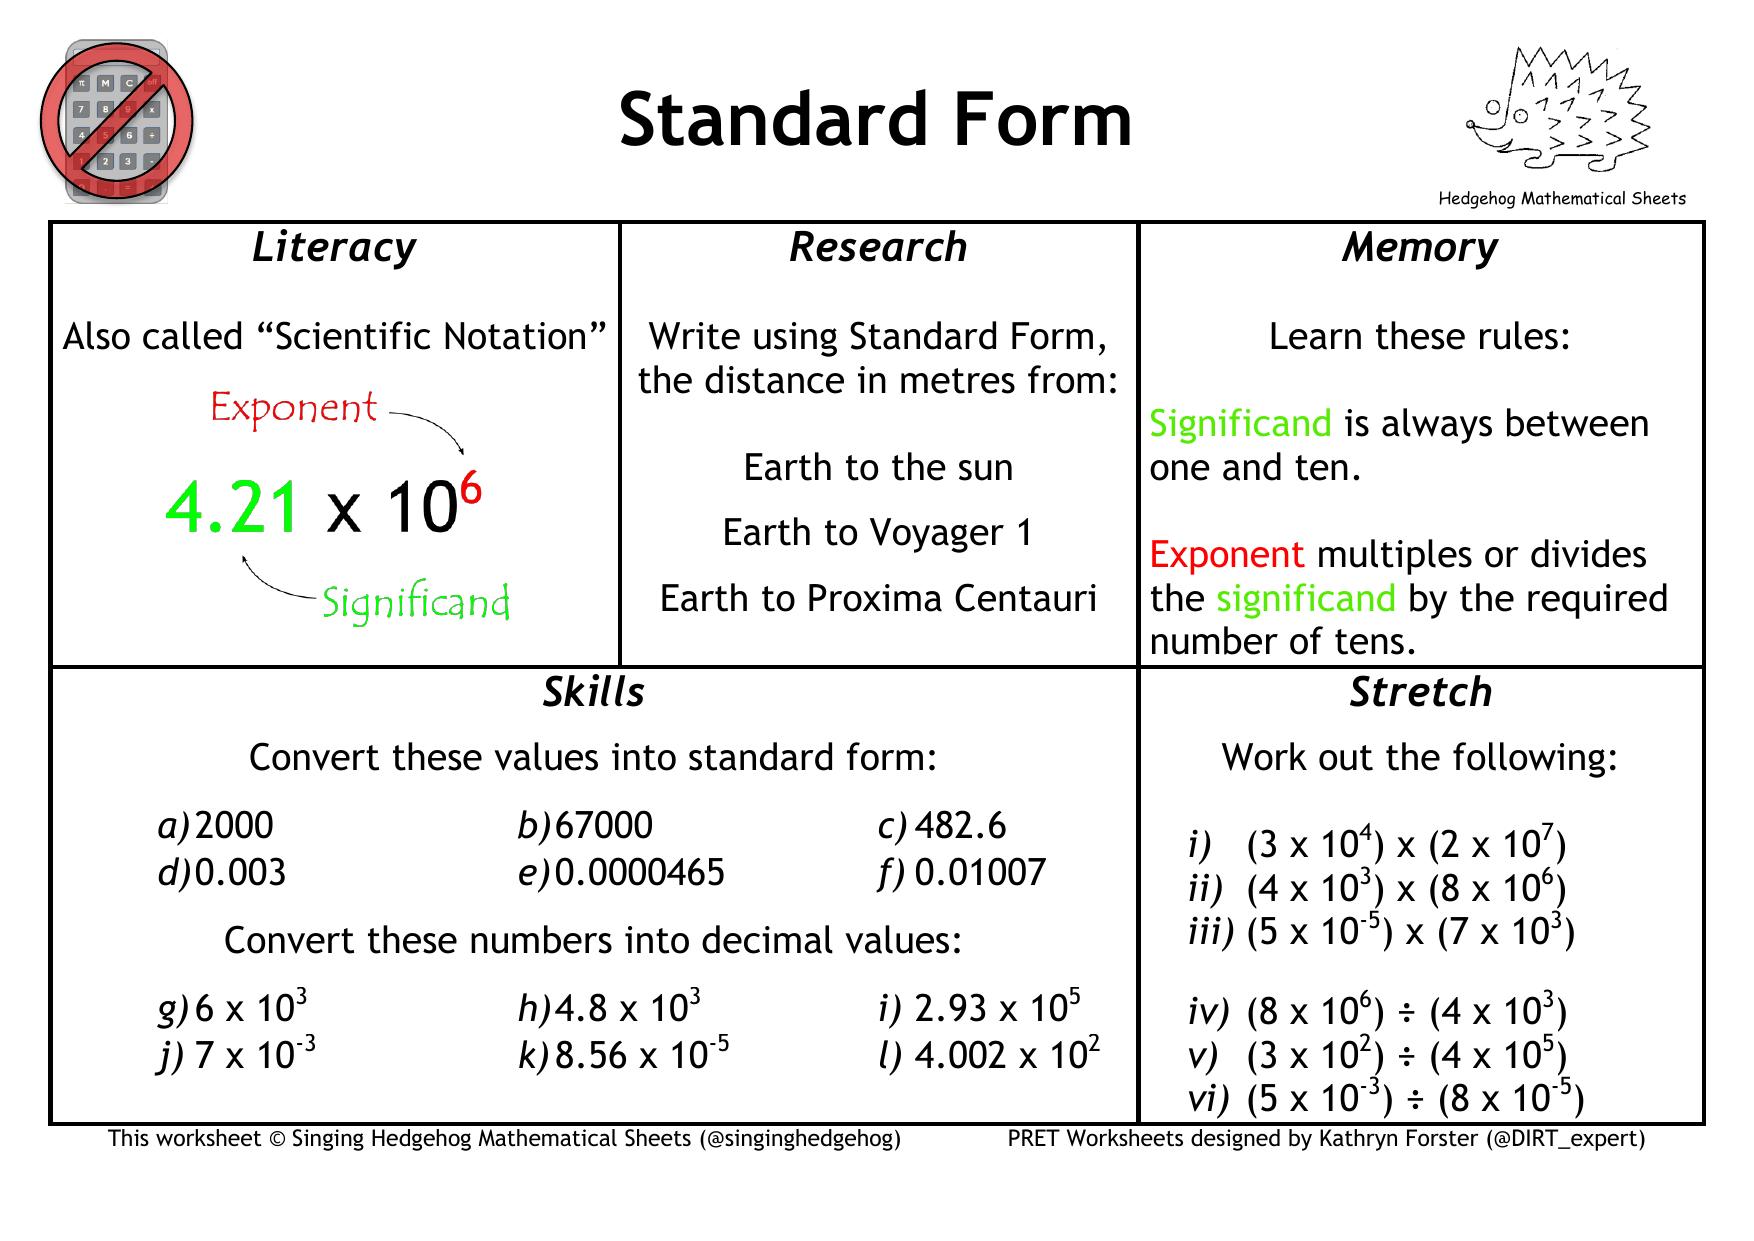 Standard form pret homework falaconquin